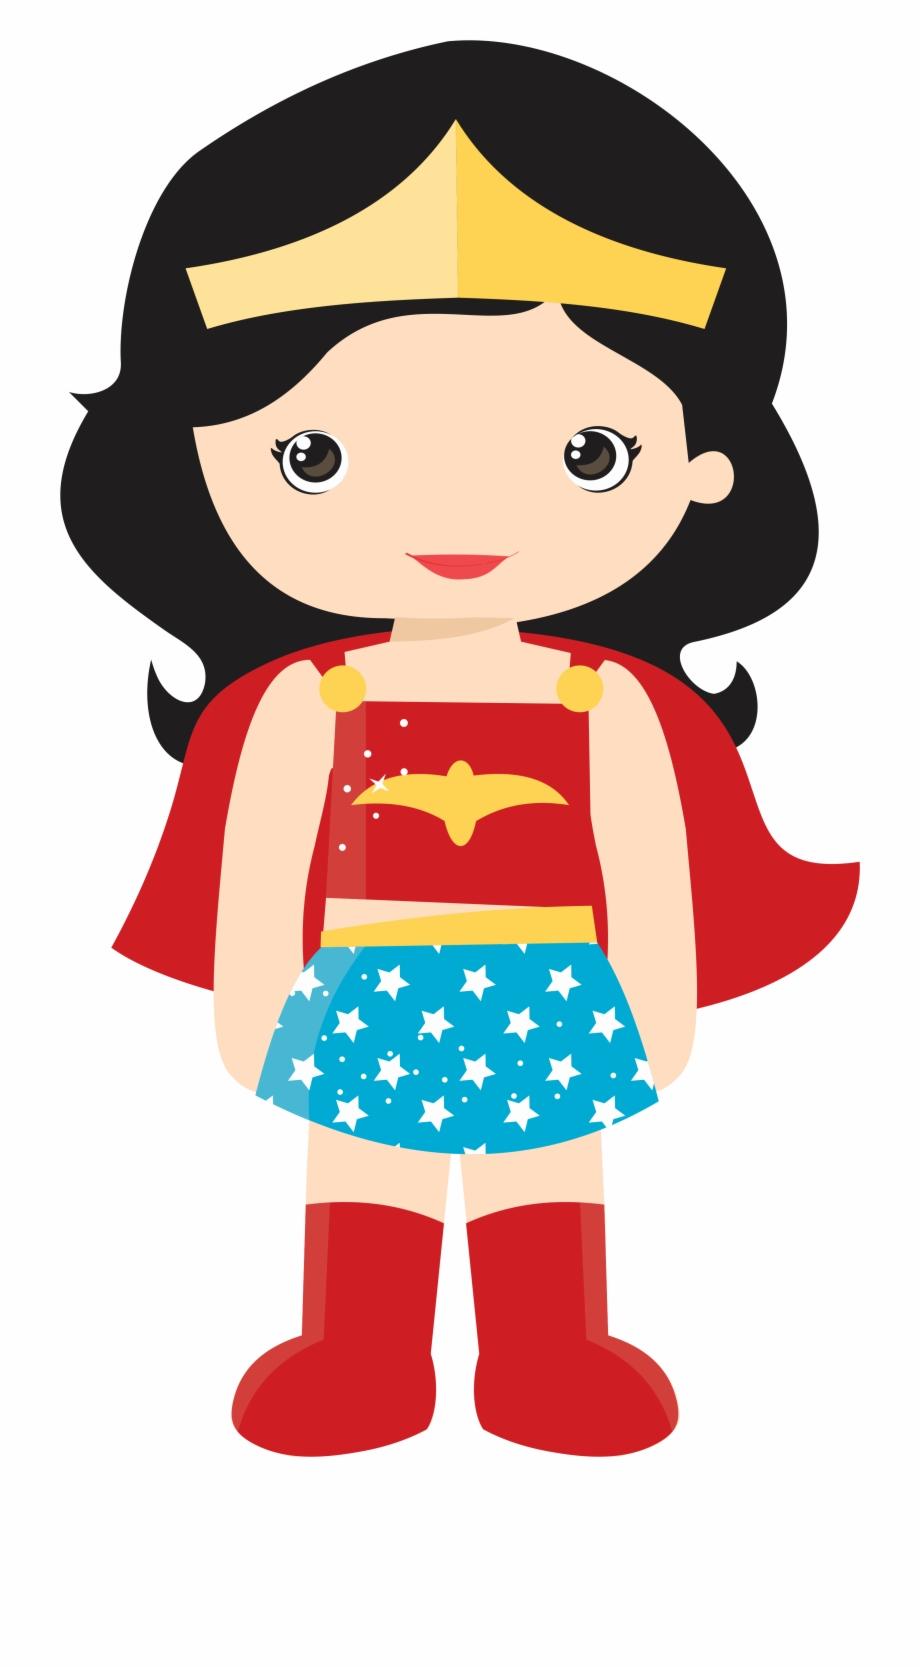 Wonder woman she can do it clipart banner transparent download Superhero Clipart - Wonder Woman Cute Png | Transparent PNG Download ... banner transparent download